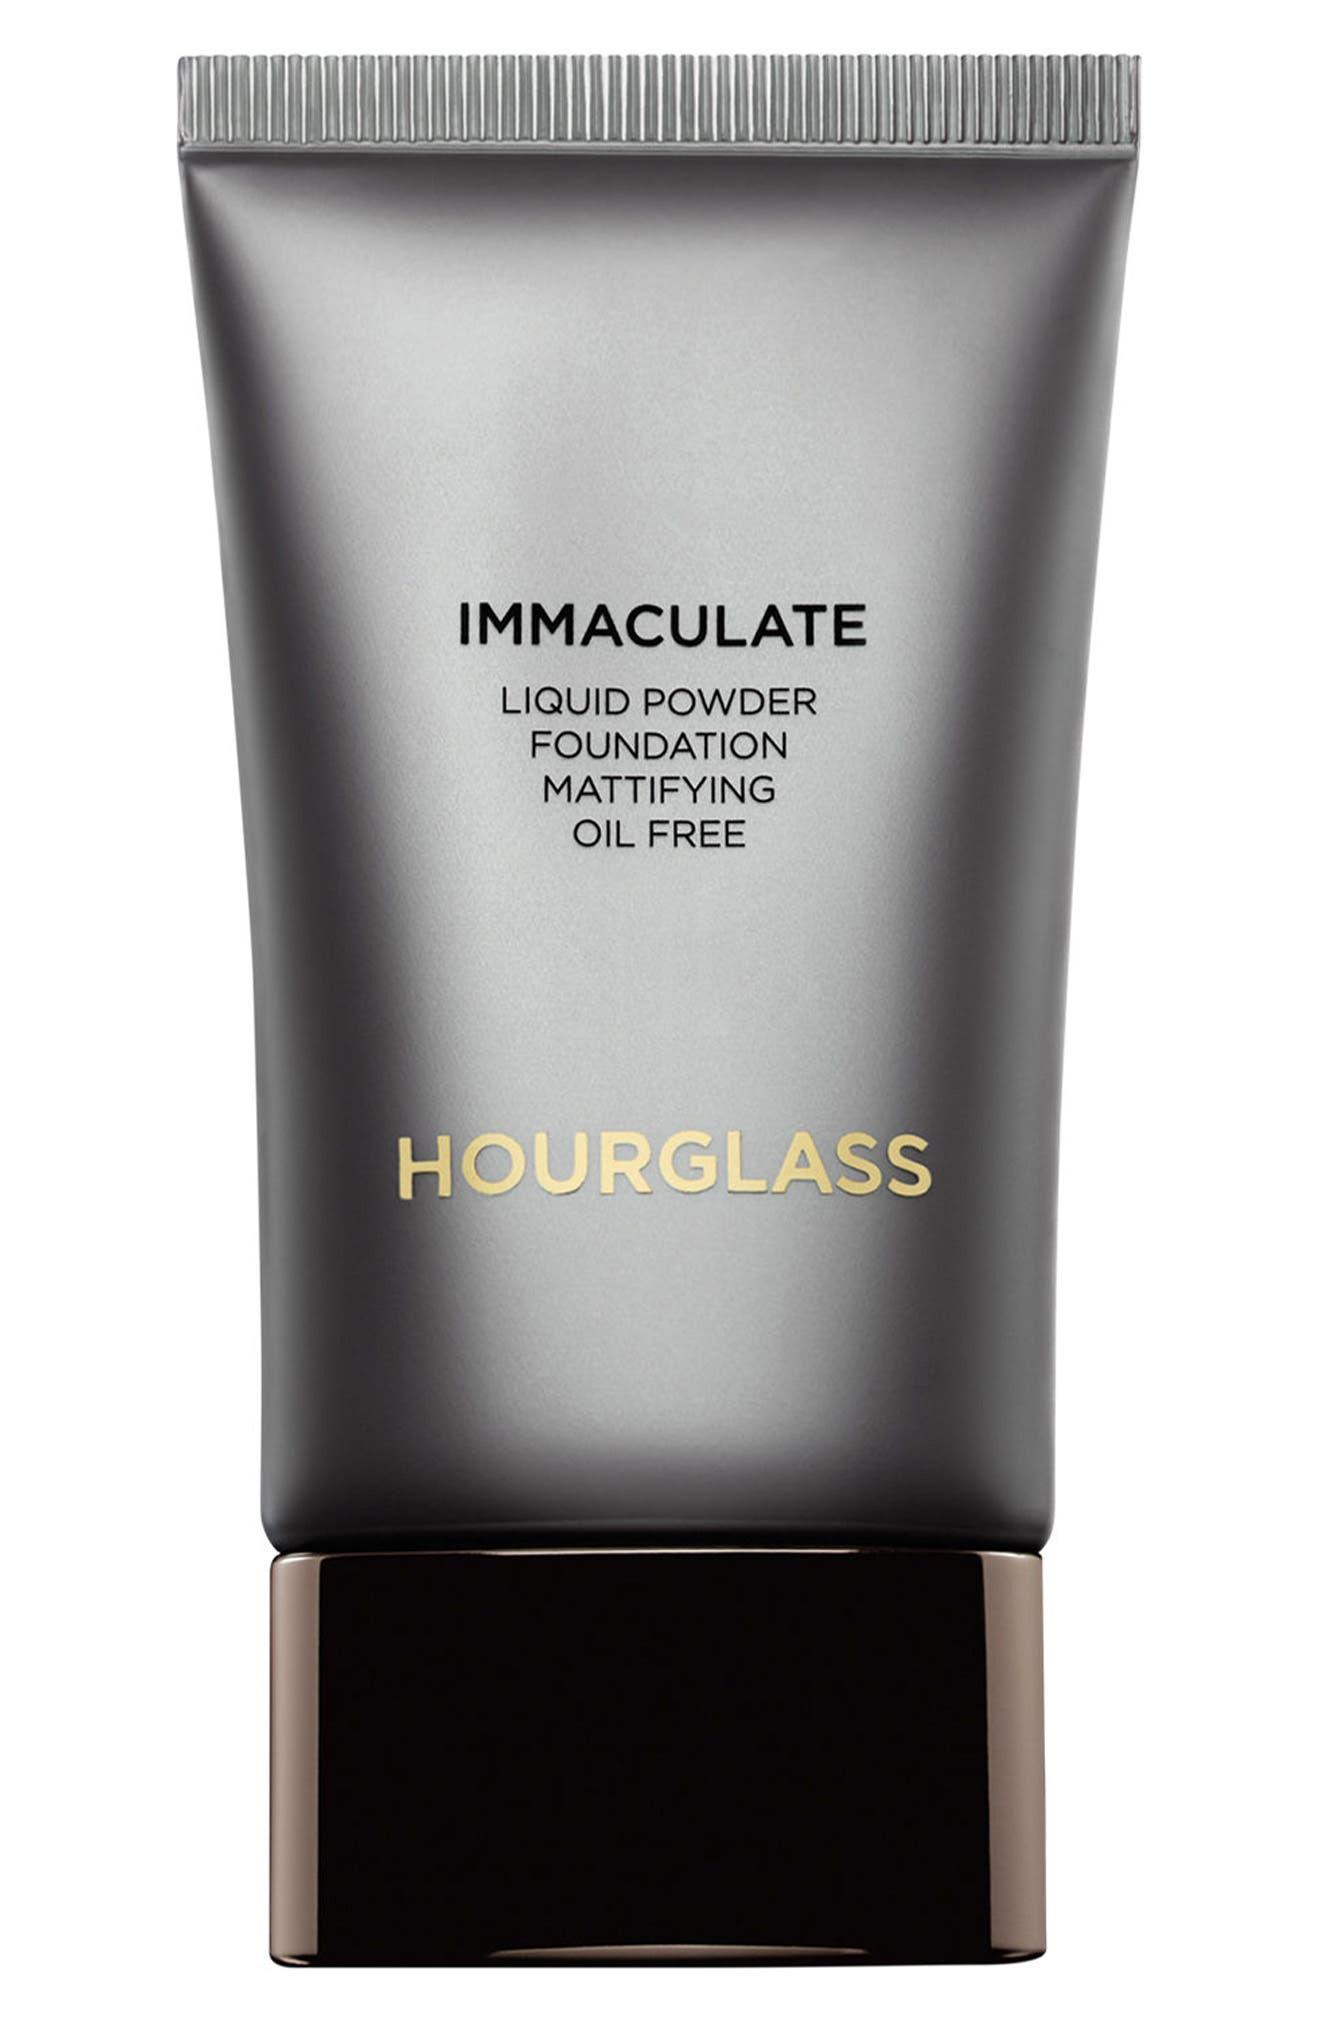 Main Image - HOURGLASS Immaculate® Liquid Powder Foundation